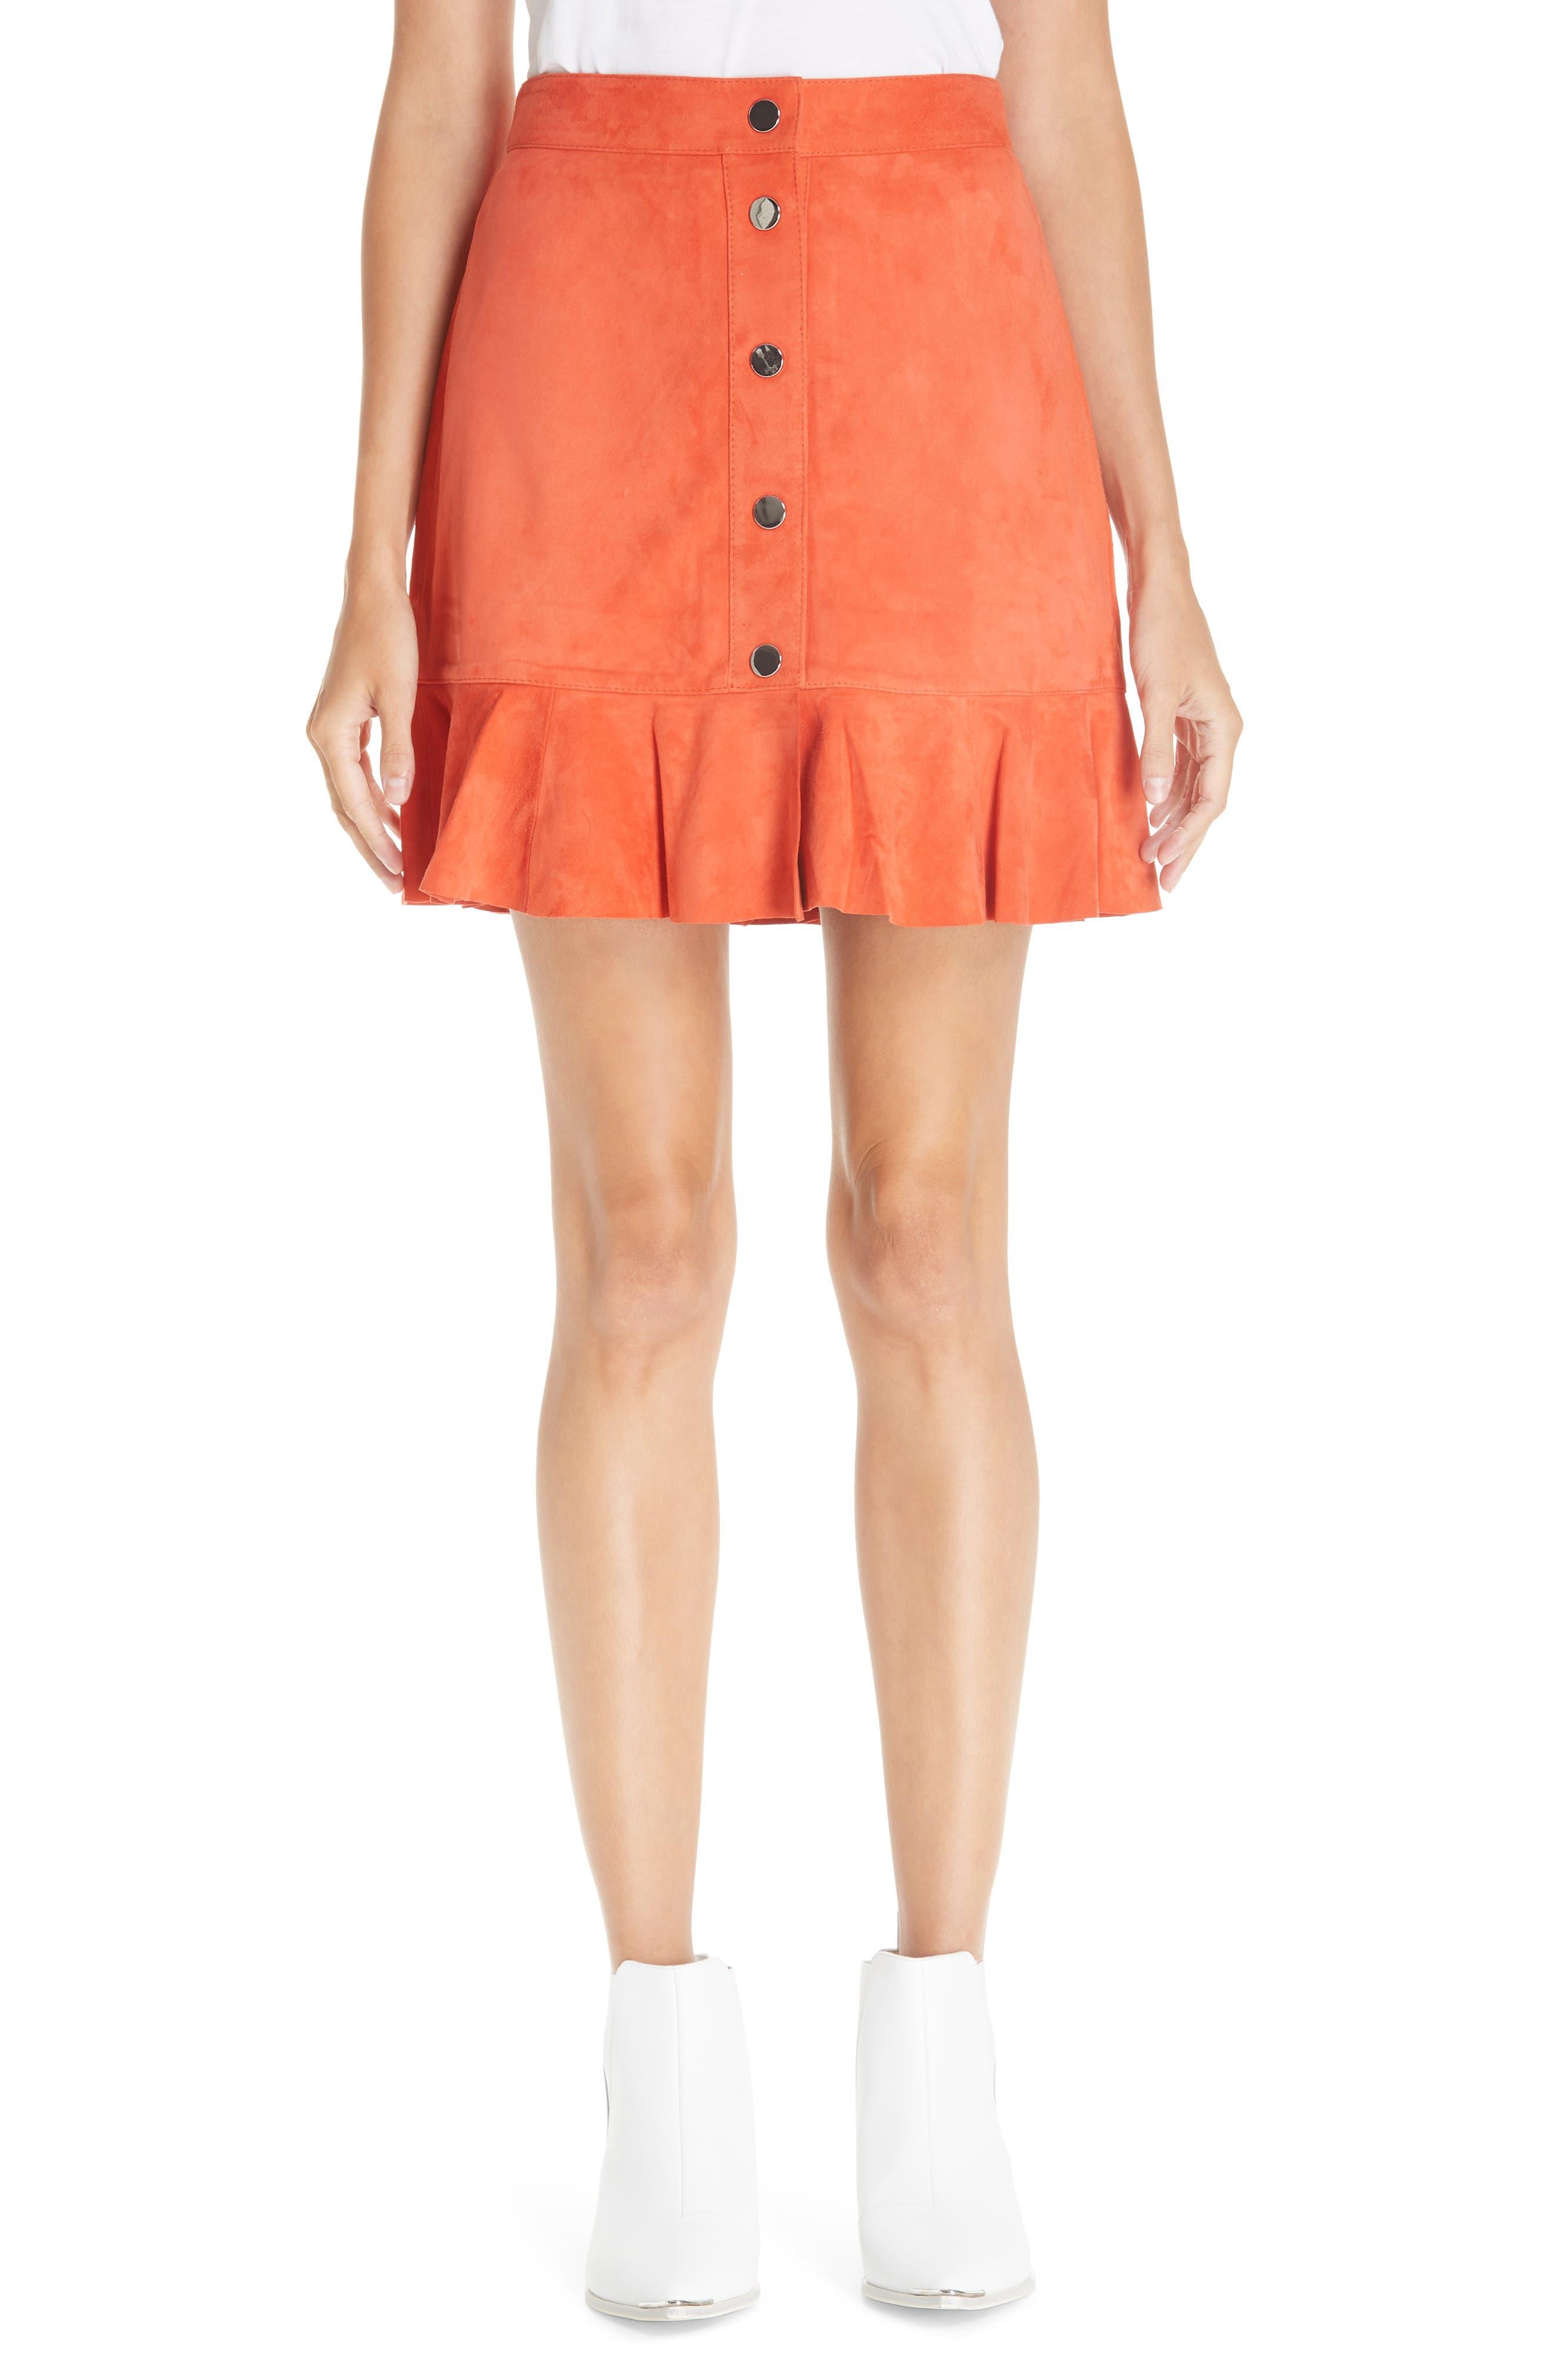 GANNI Salvia Suede Skirt, Main, color, 800